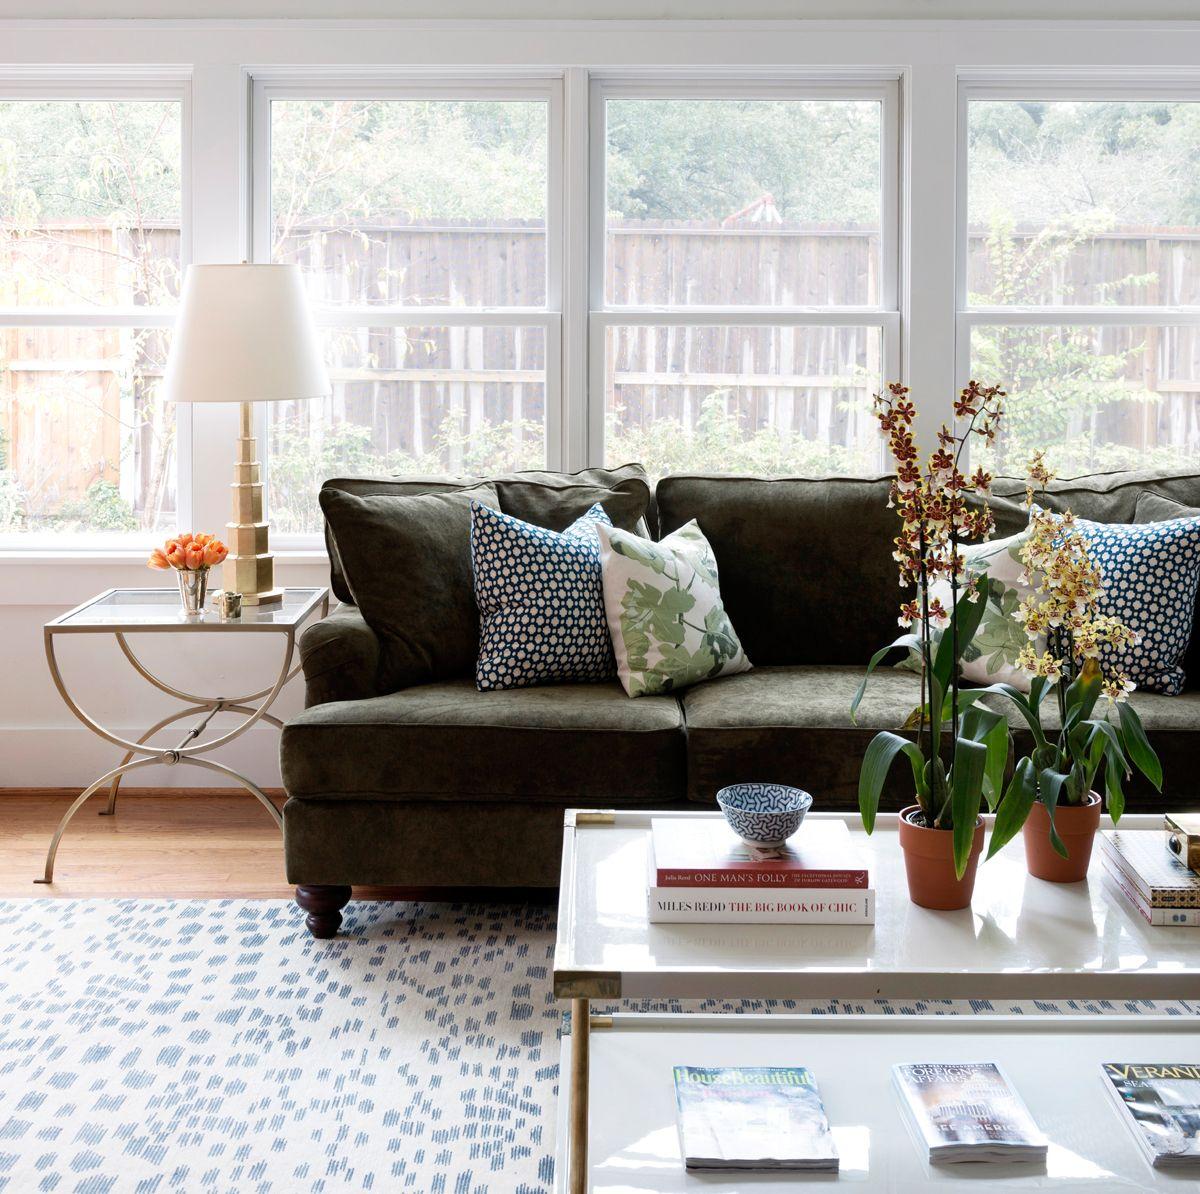 Home N Decor Interior Design Part - 41: House Beautiful